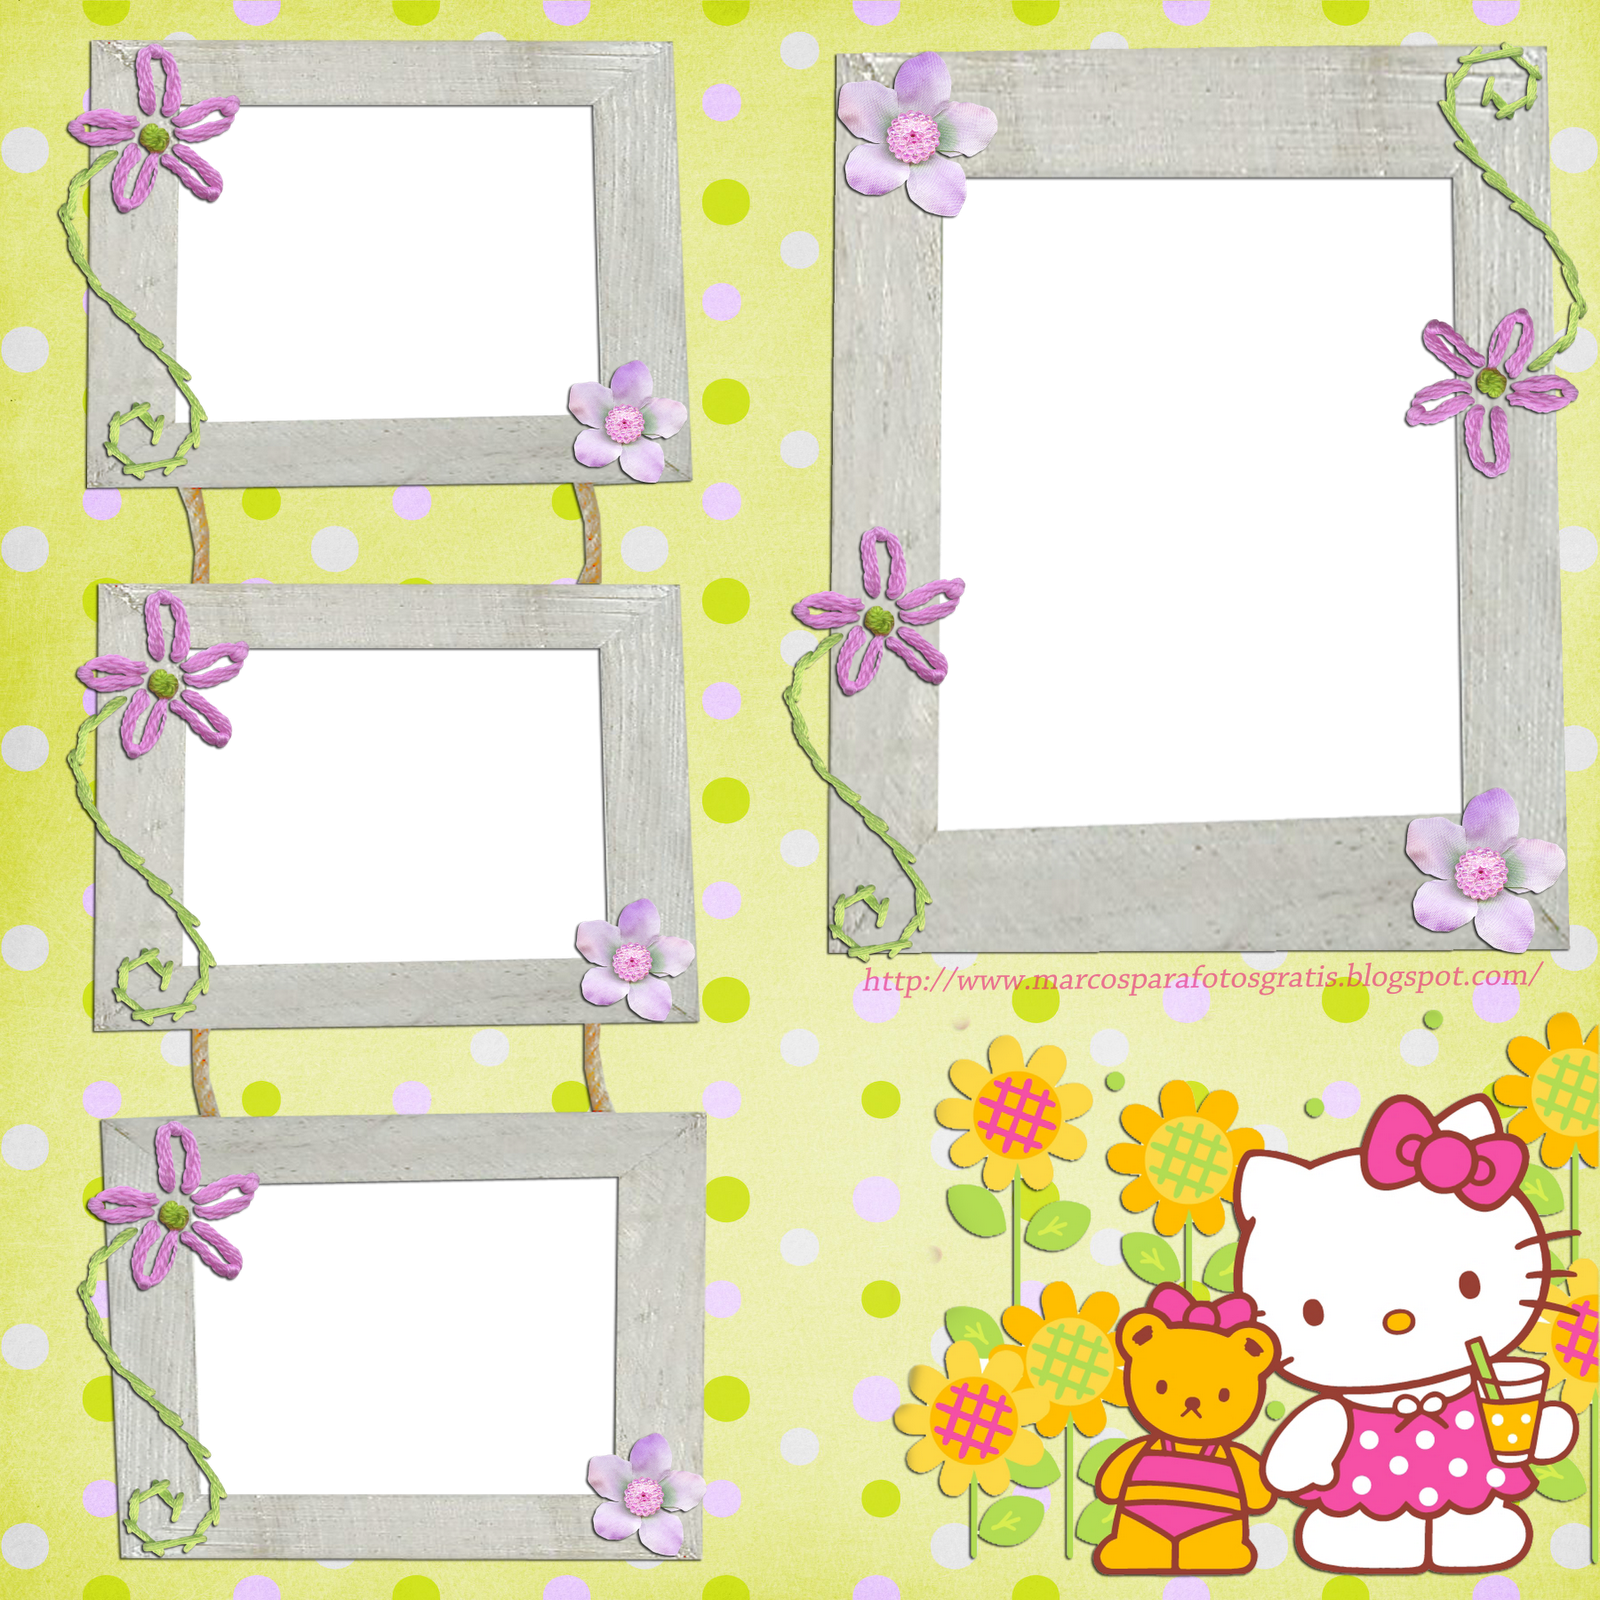 Scrapbook ideas hello kitty - Marcos Para Photoshop Y Algo Mas Hello Kitty